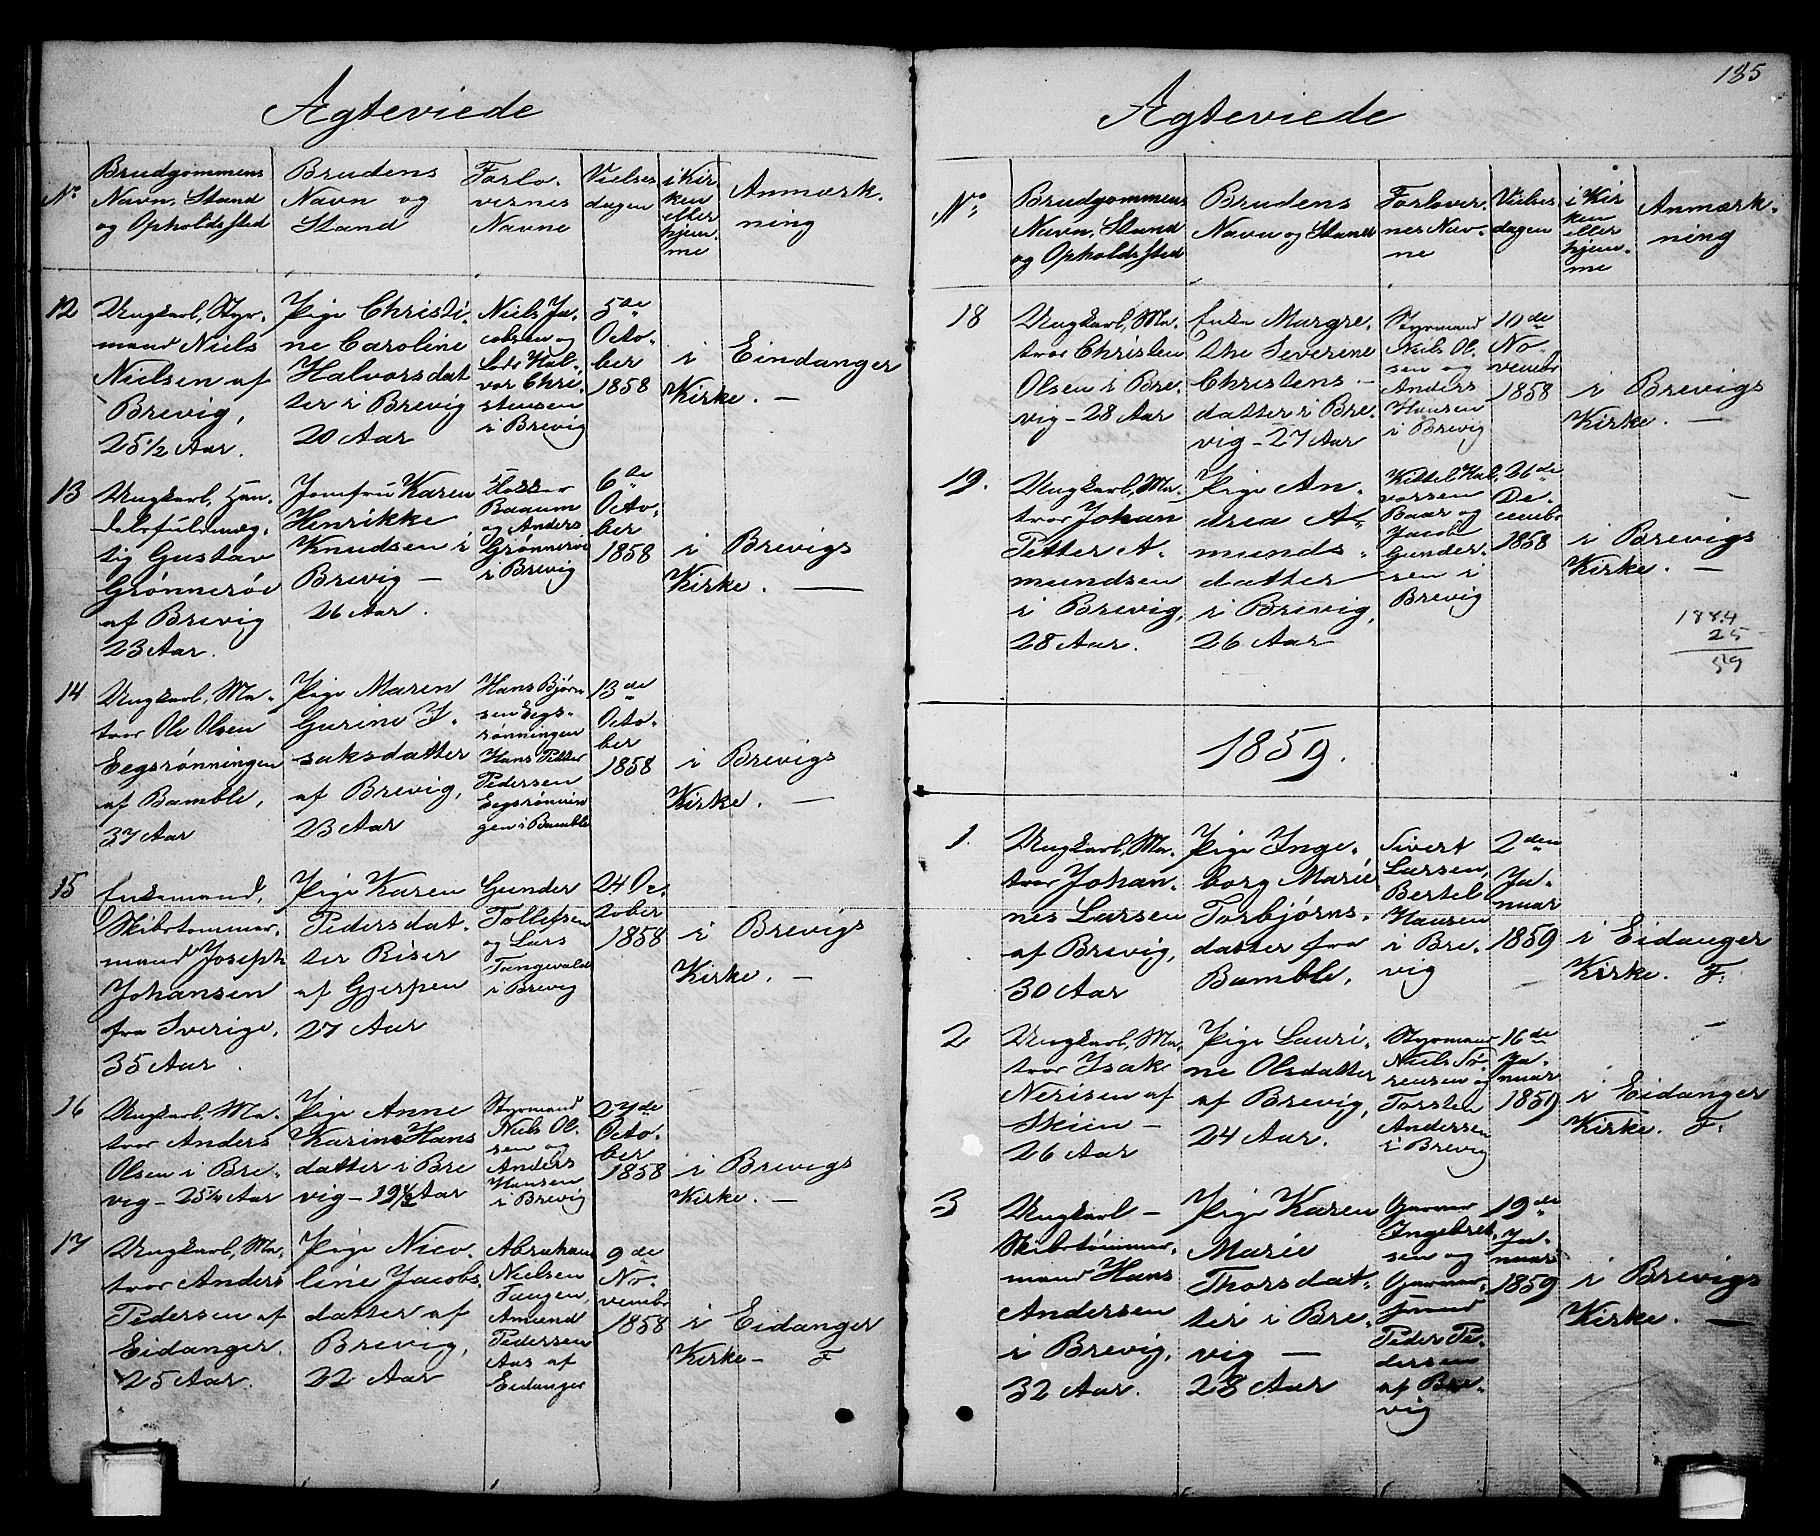 SAKO, Brevik kirkebøker, G/Ga/L0002: Klokkerbok nr. 2, 1846-1865, s. 185